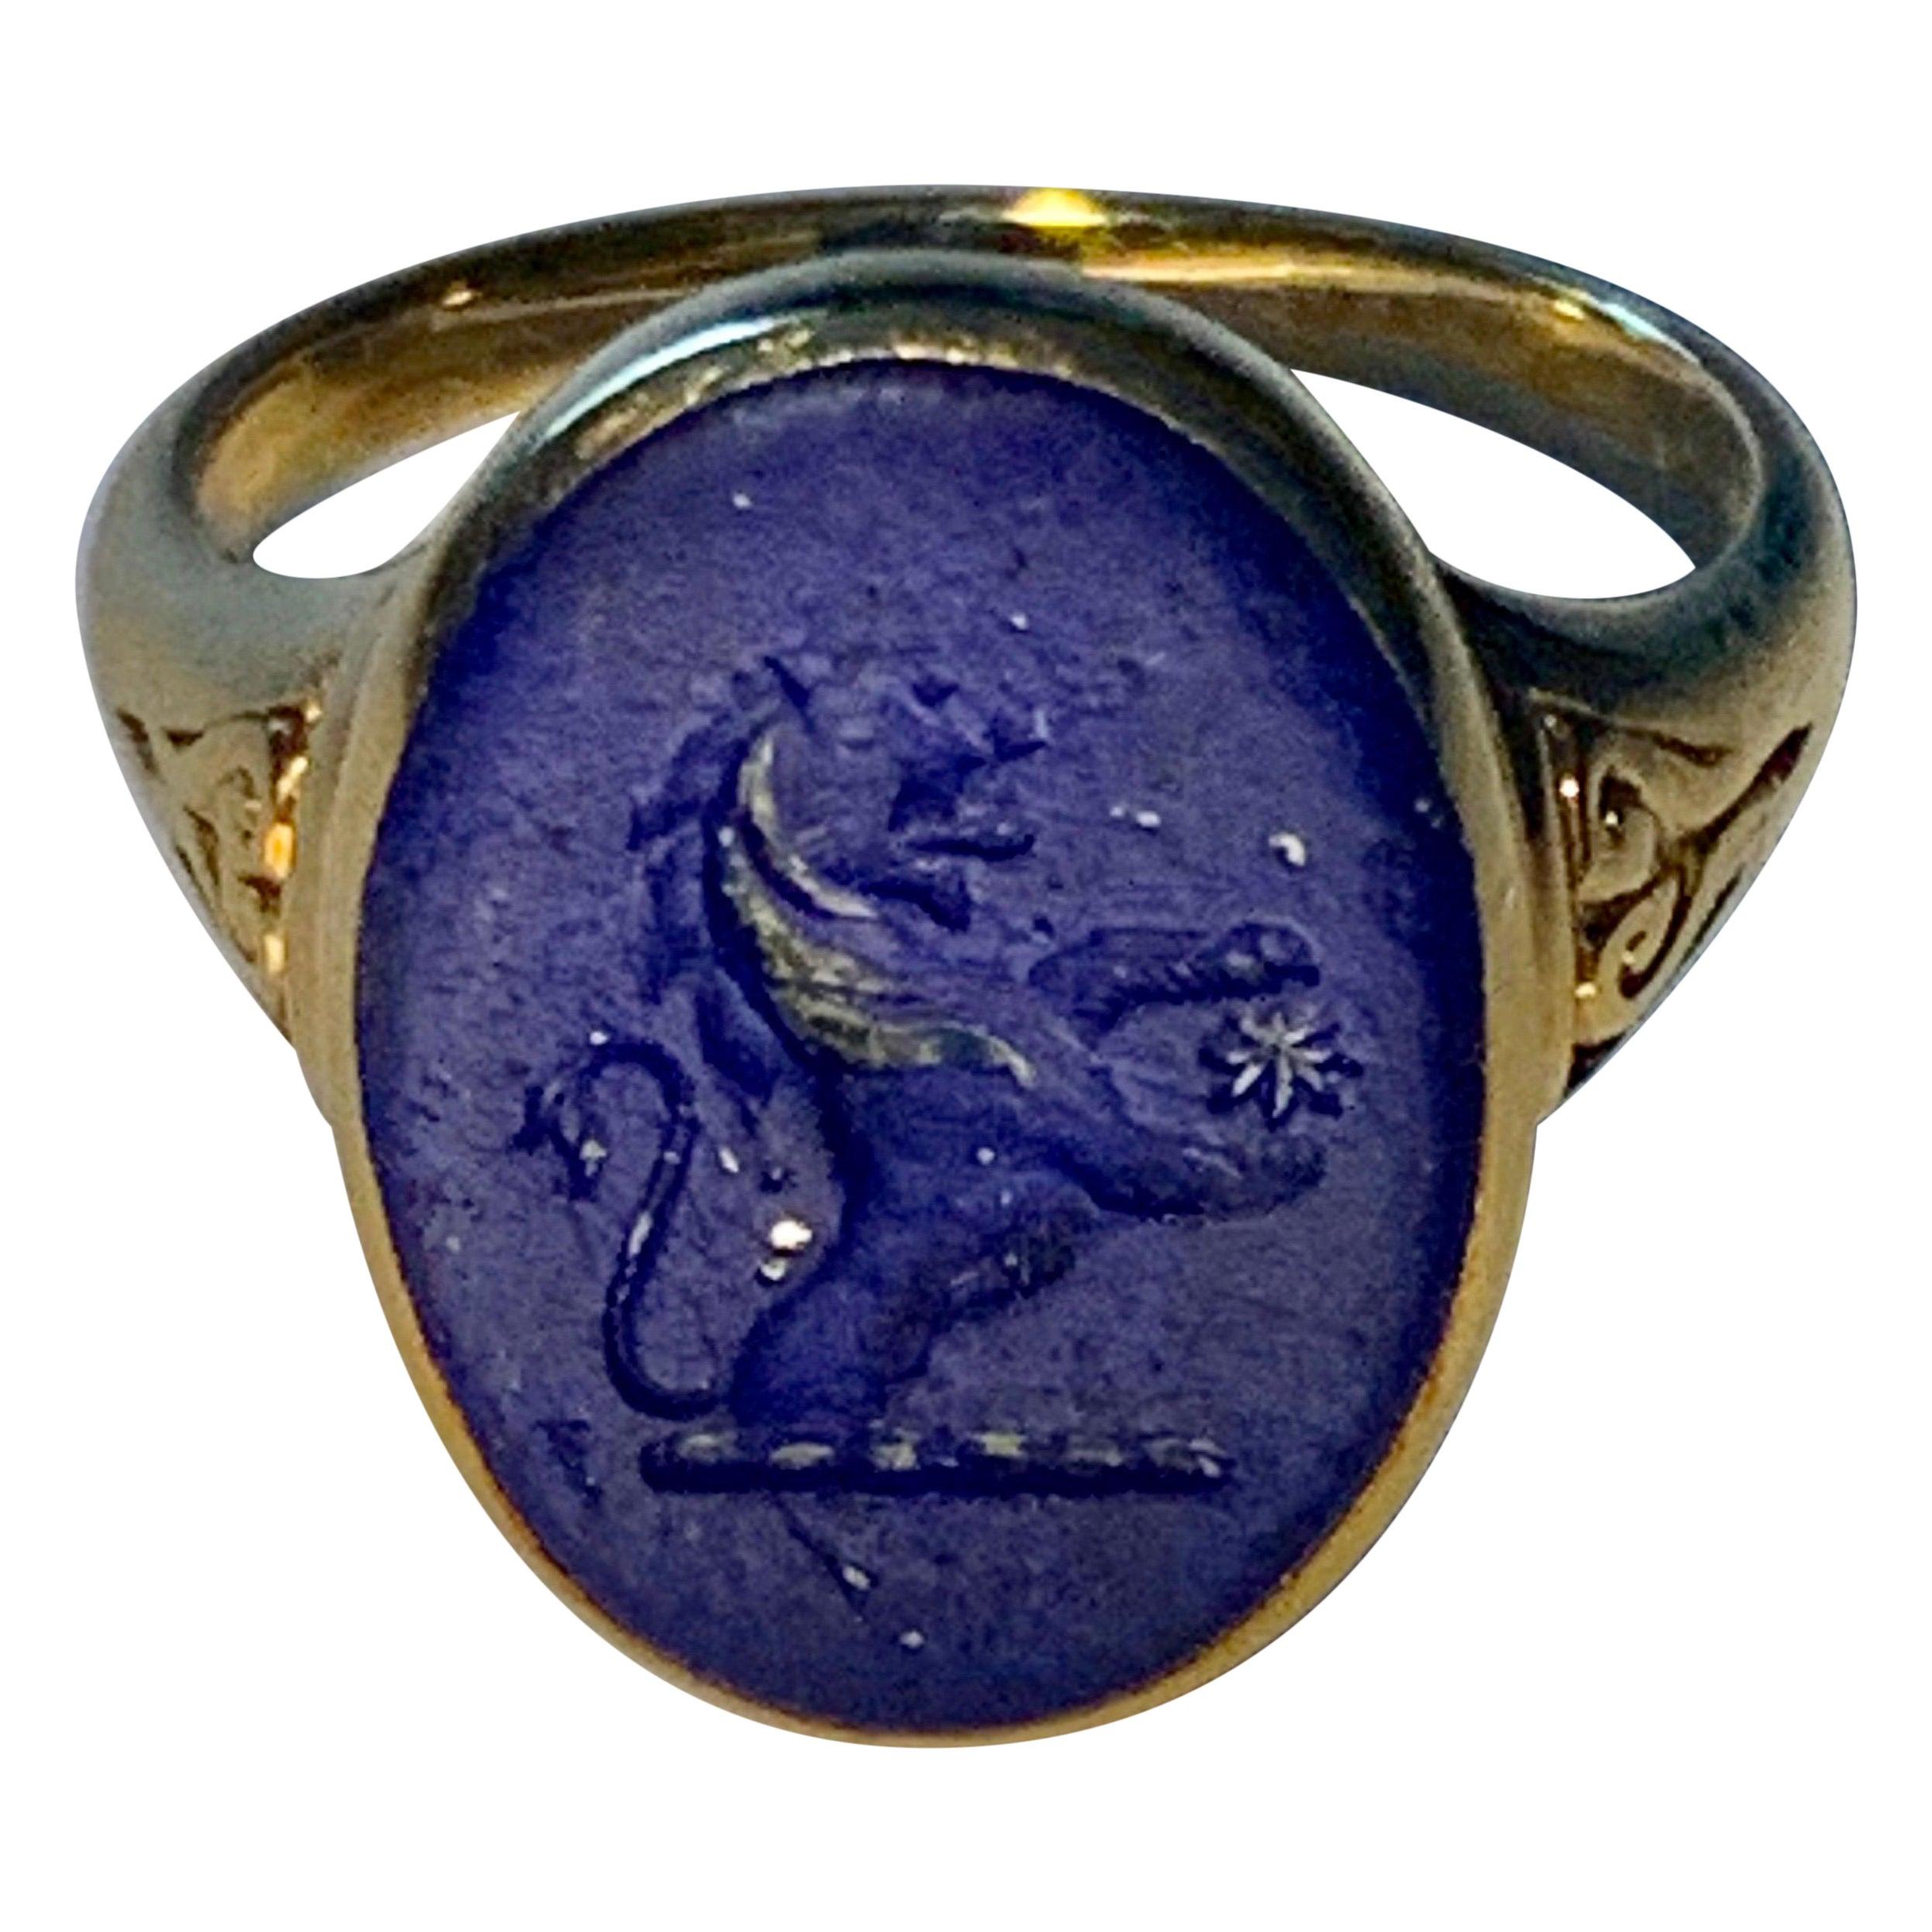 Lovely Antique Lapis Lazuli Gold Armorial Signet Ring 18k Gold